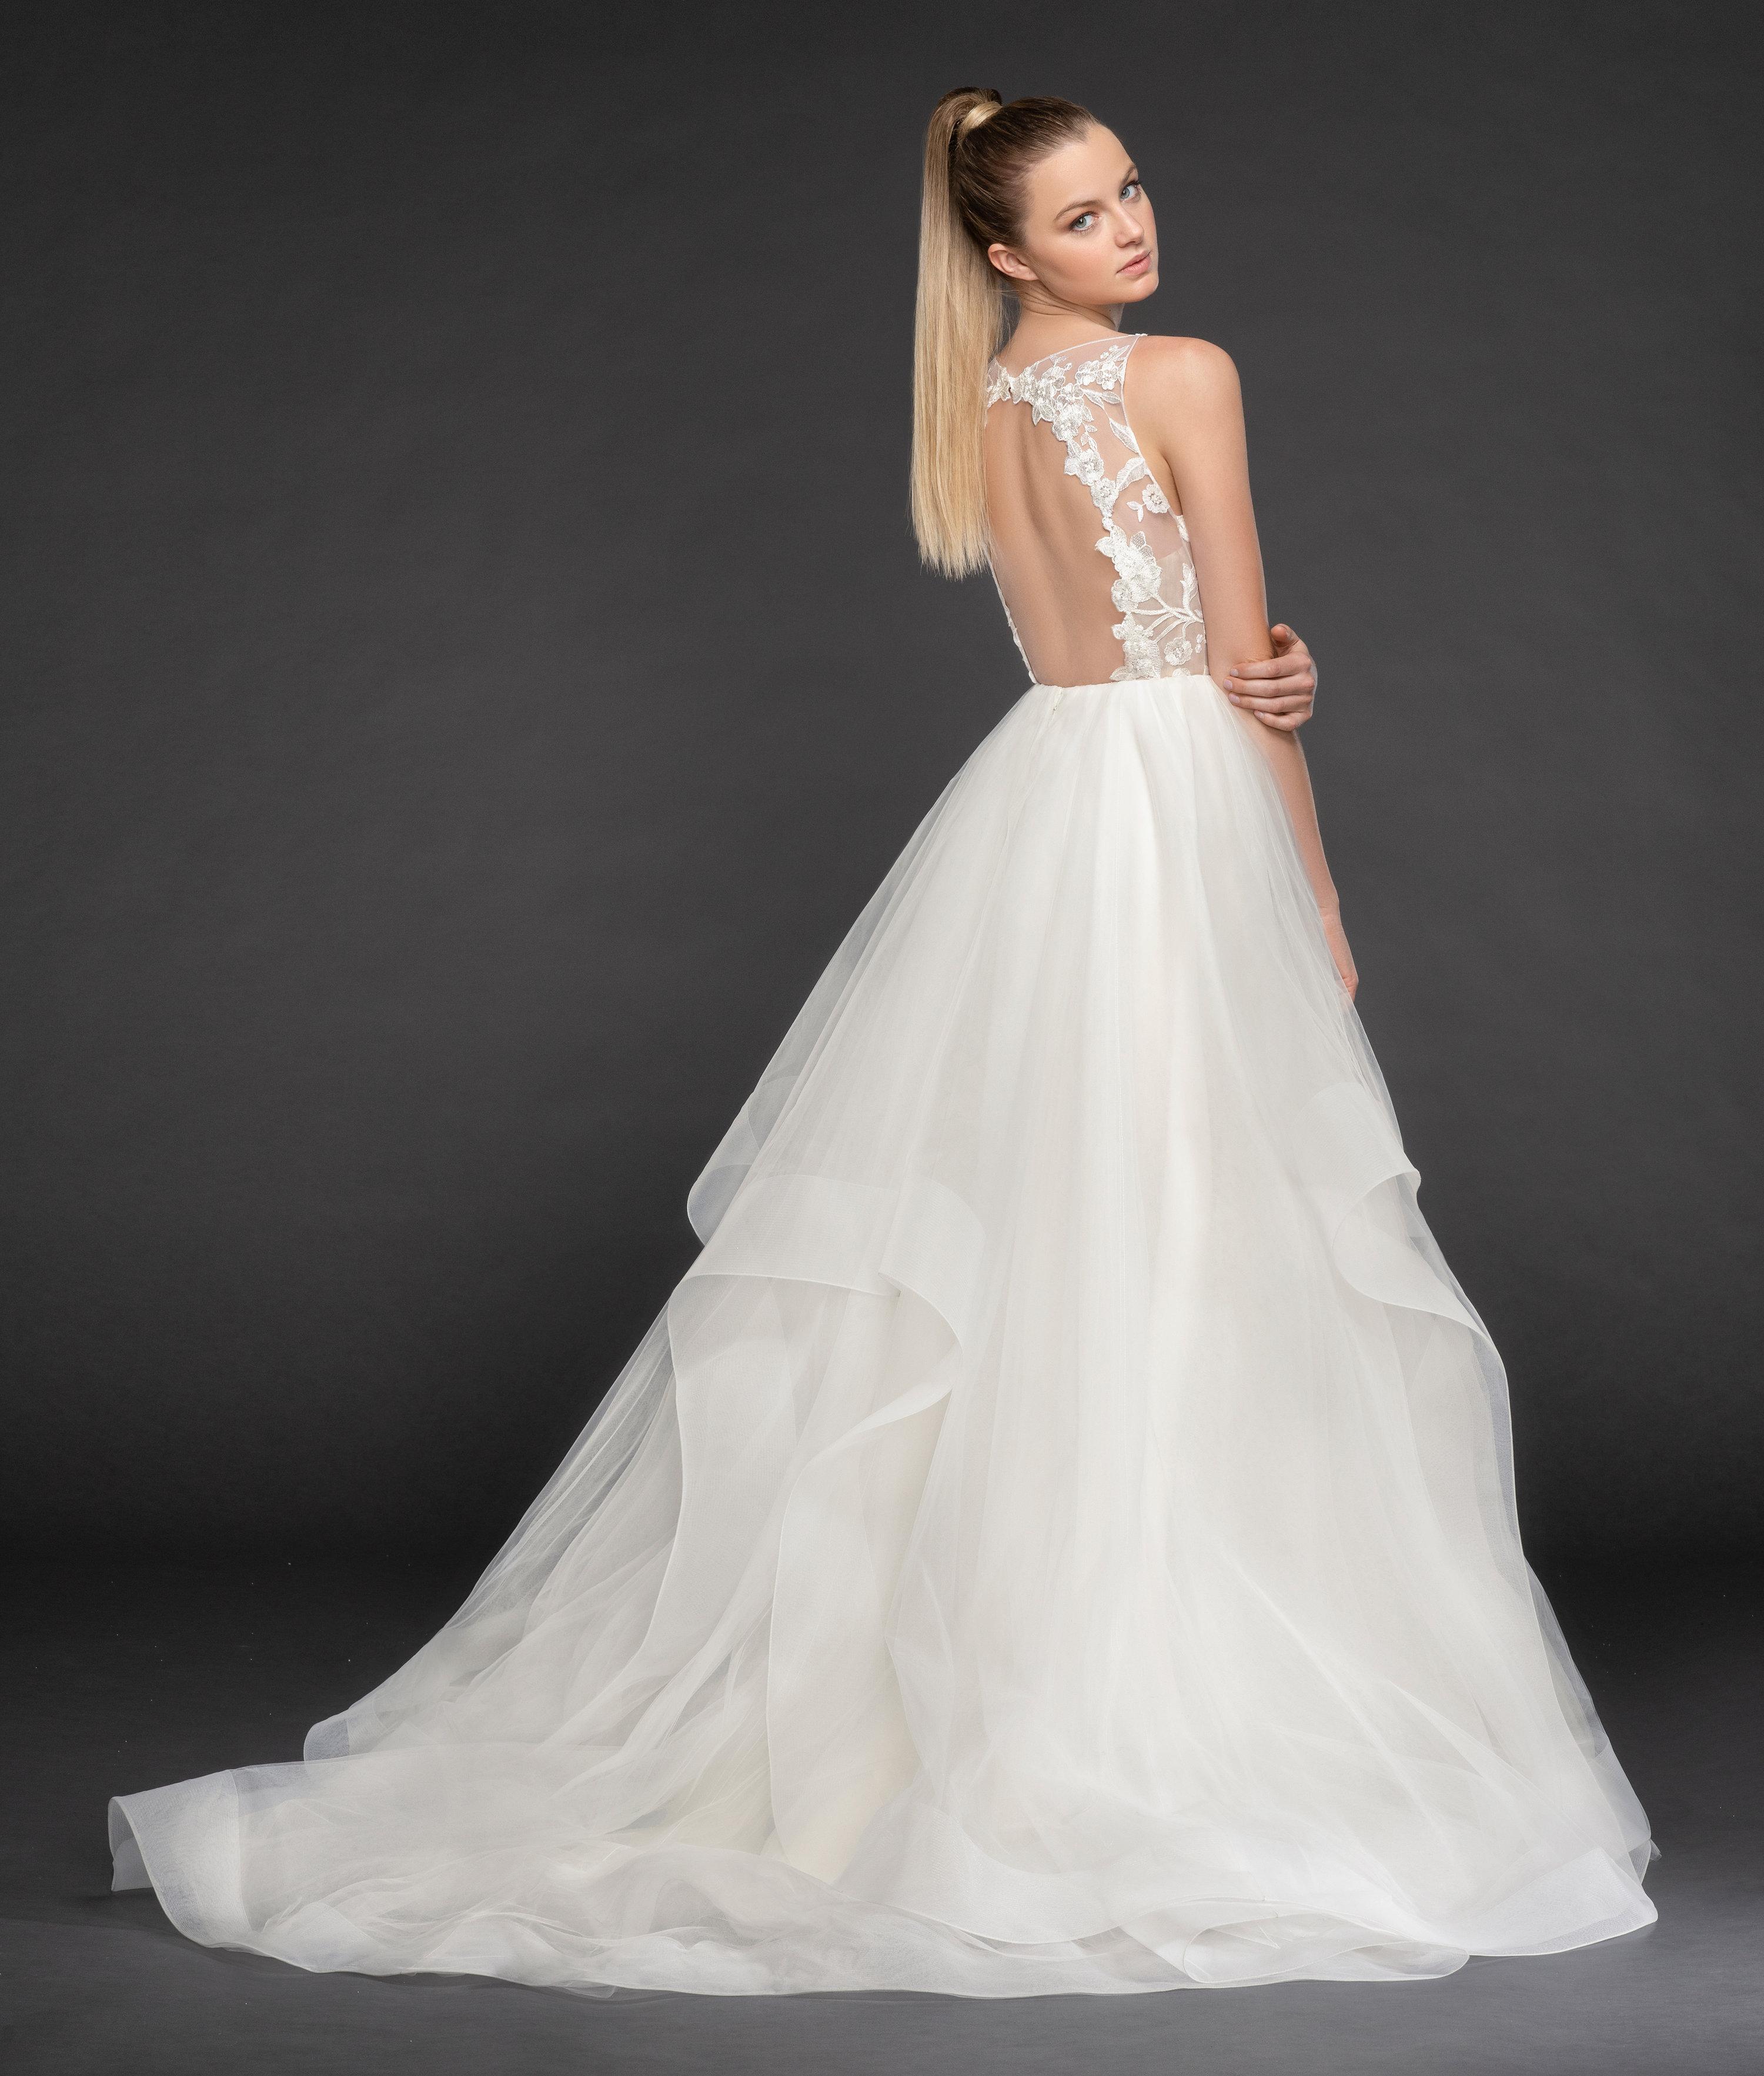 V-Neckline Floral Appliqué Sleeveless Ball Gown Wedding Dress ...